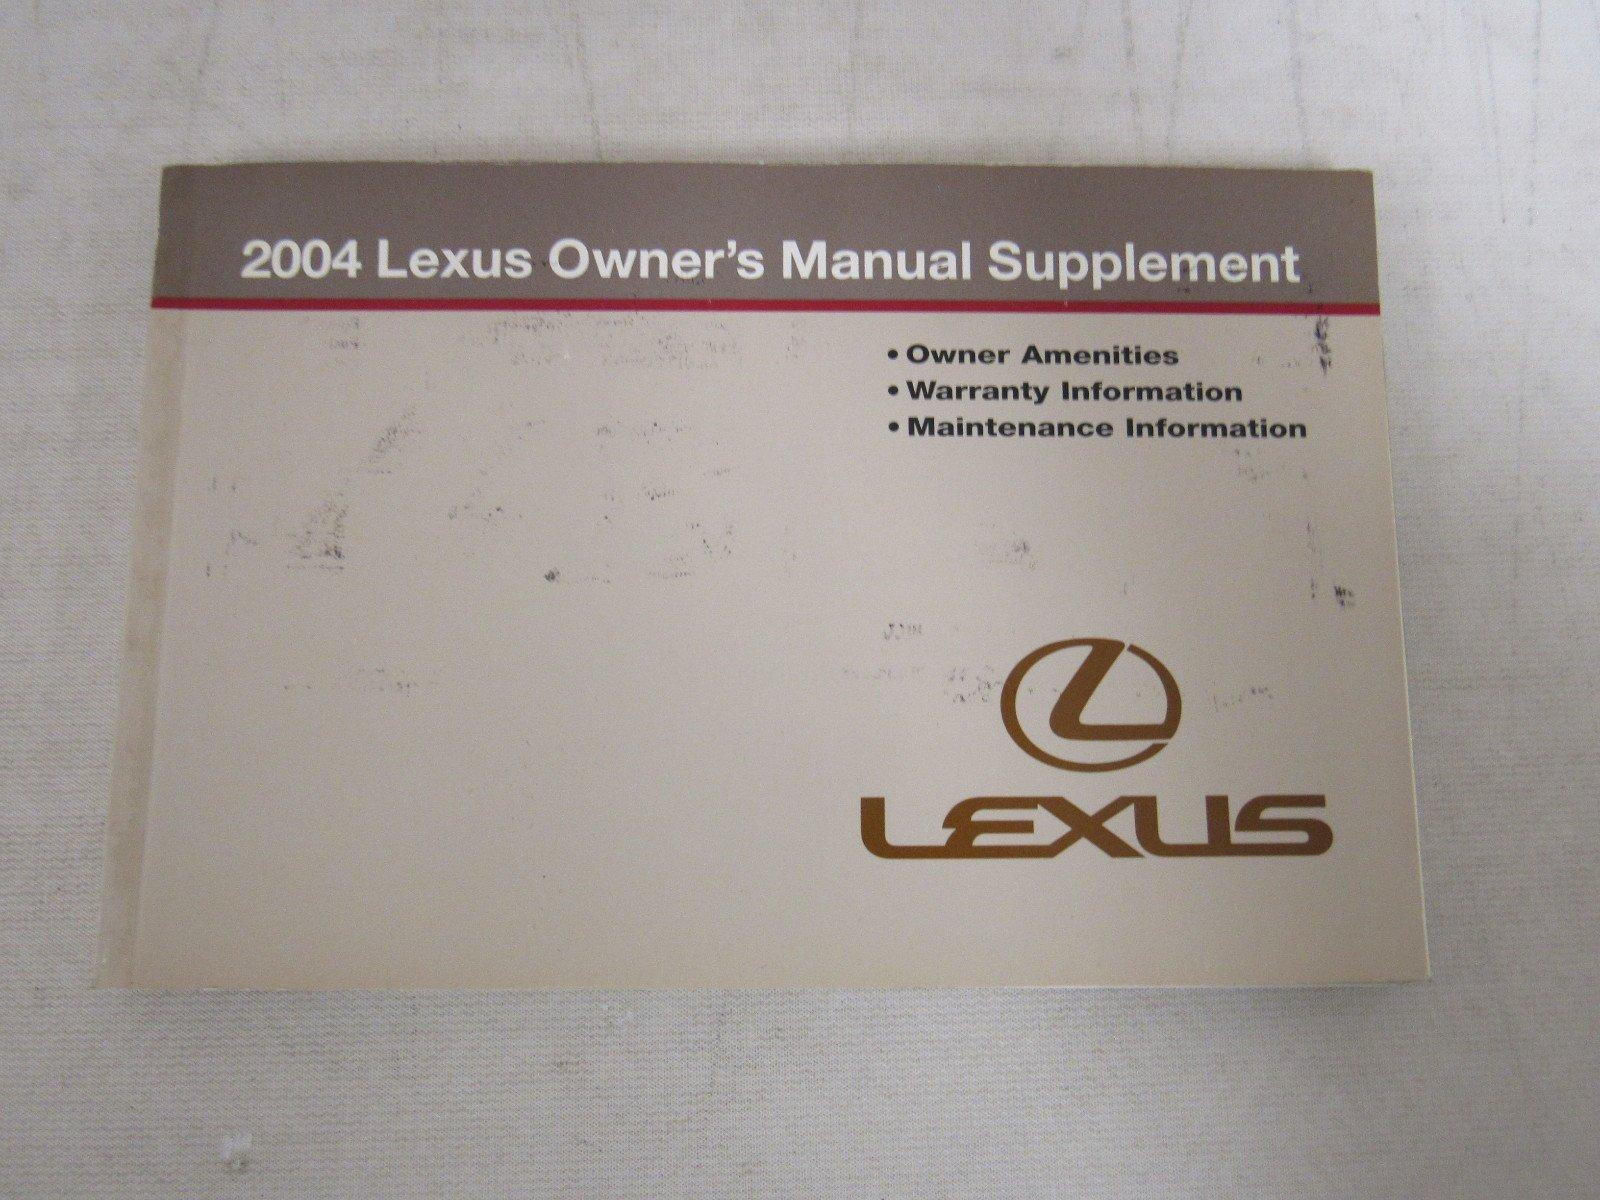 Lexus rx300 repair manual ebook array 2004 lexus owners manual professional user manual ebooks u2022 rh gogradresumes com fandeluxe Images